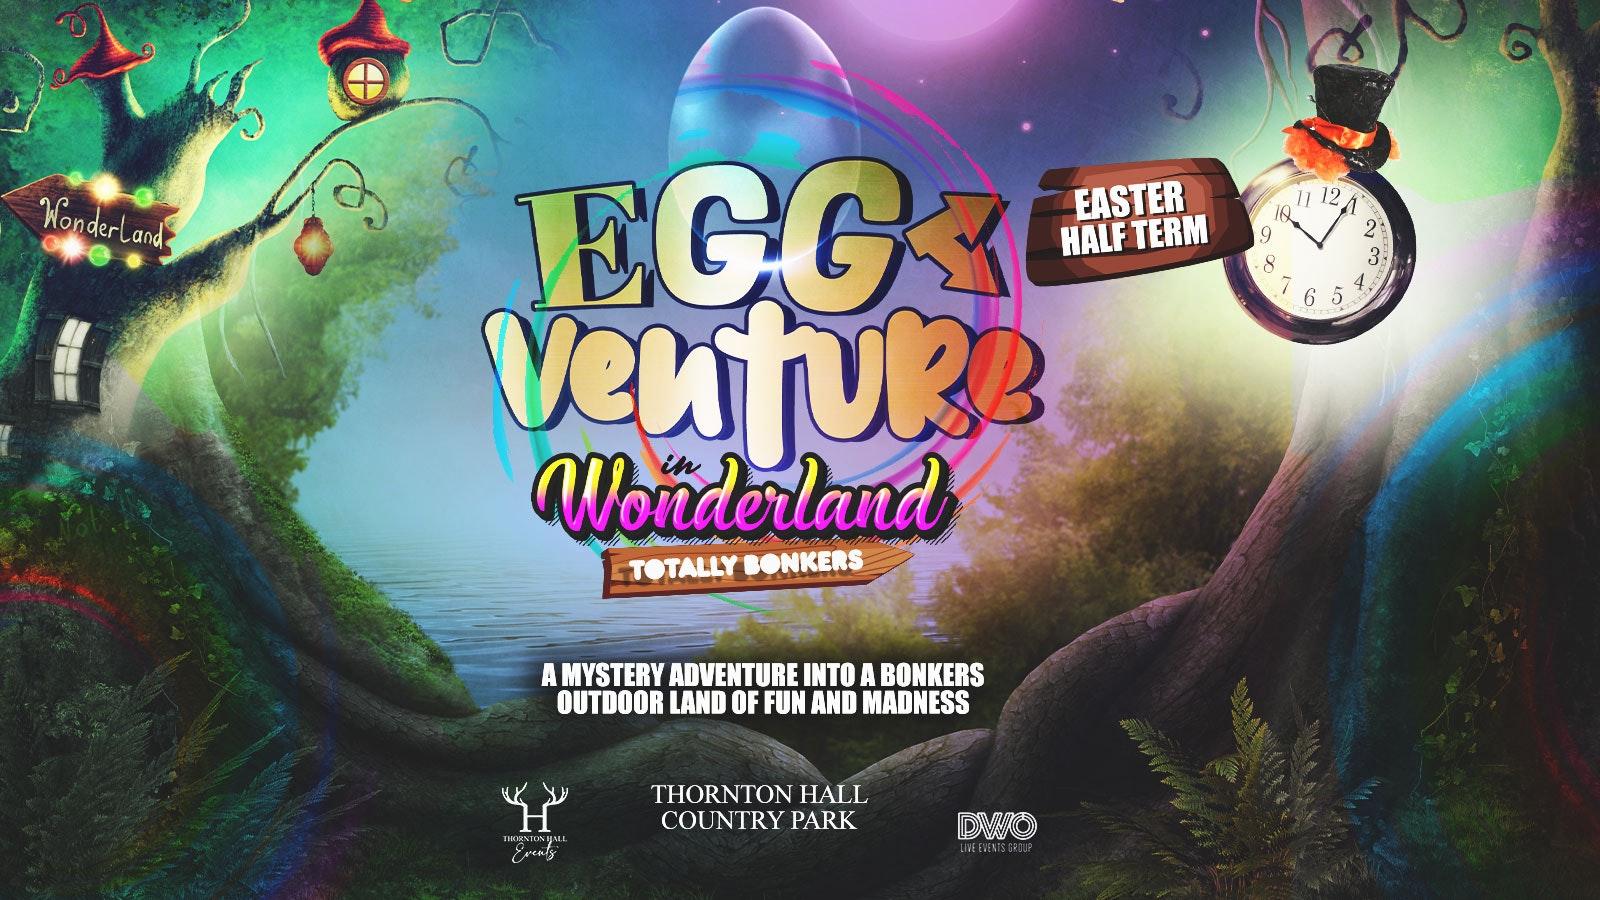 EggVenture in Wonderland – Wednesday 7th April – 12pm